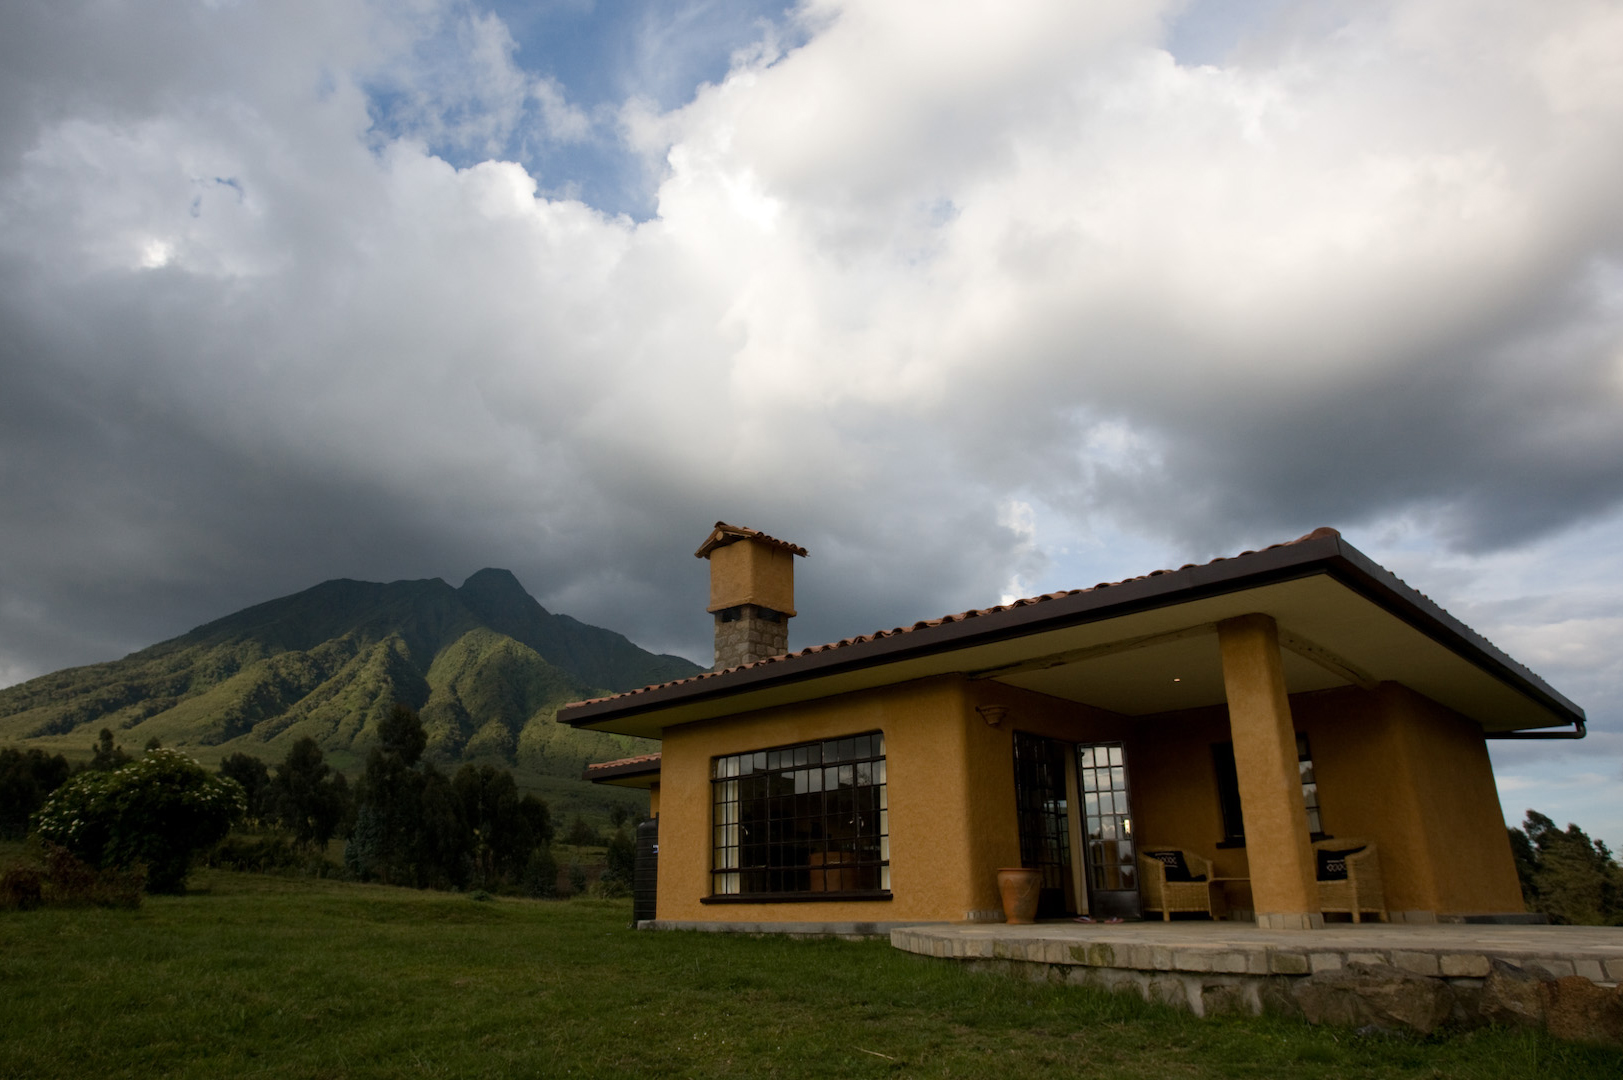 rwanda-sabyinyo-silverback-lodge-room-exterior